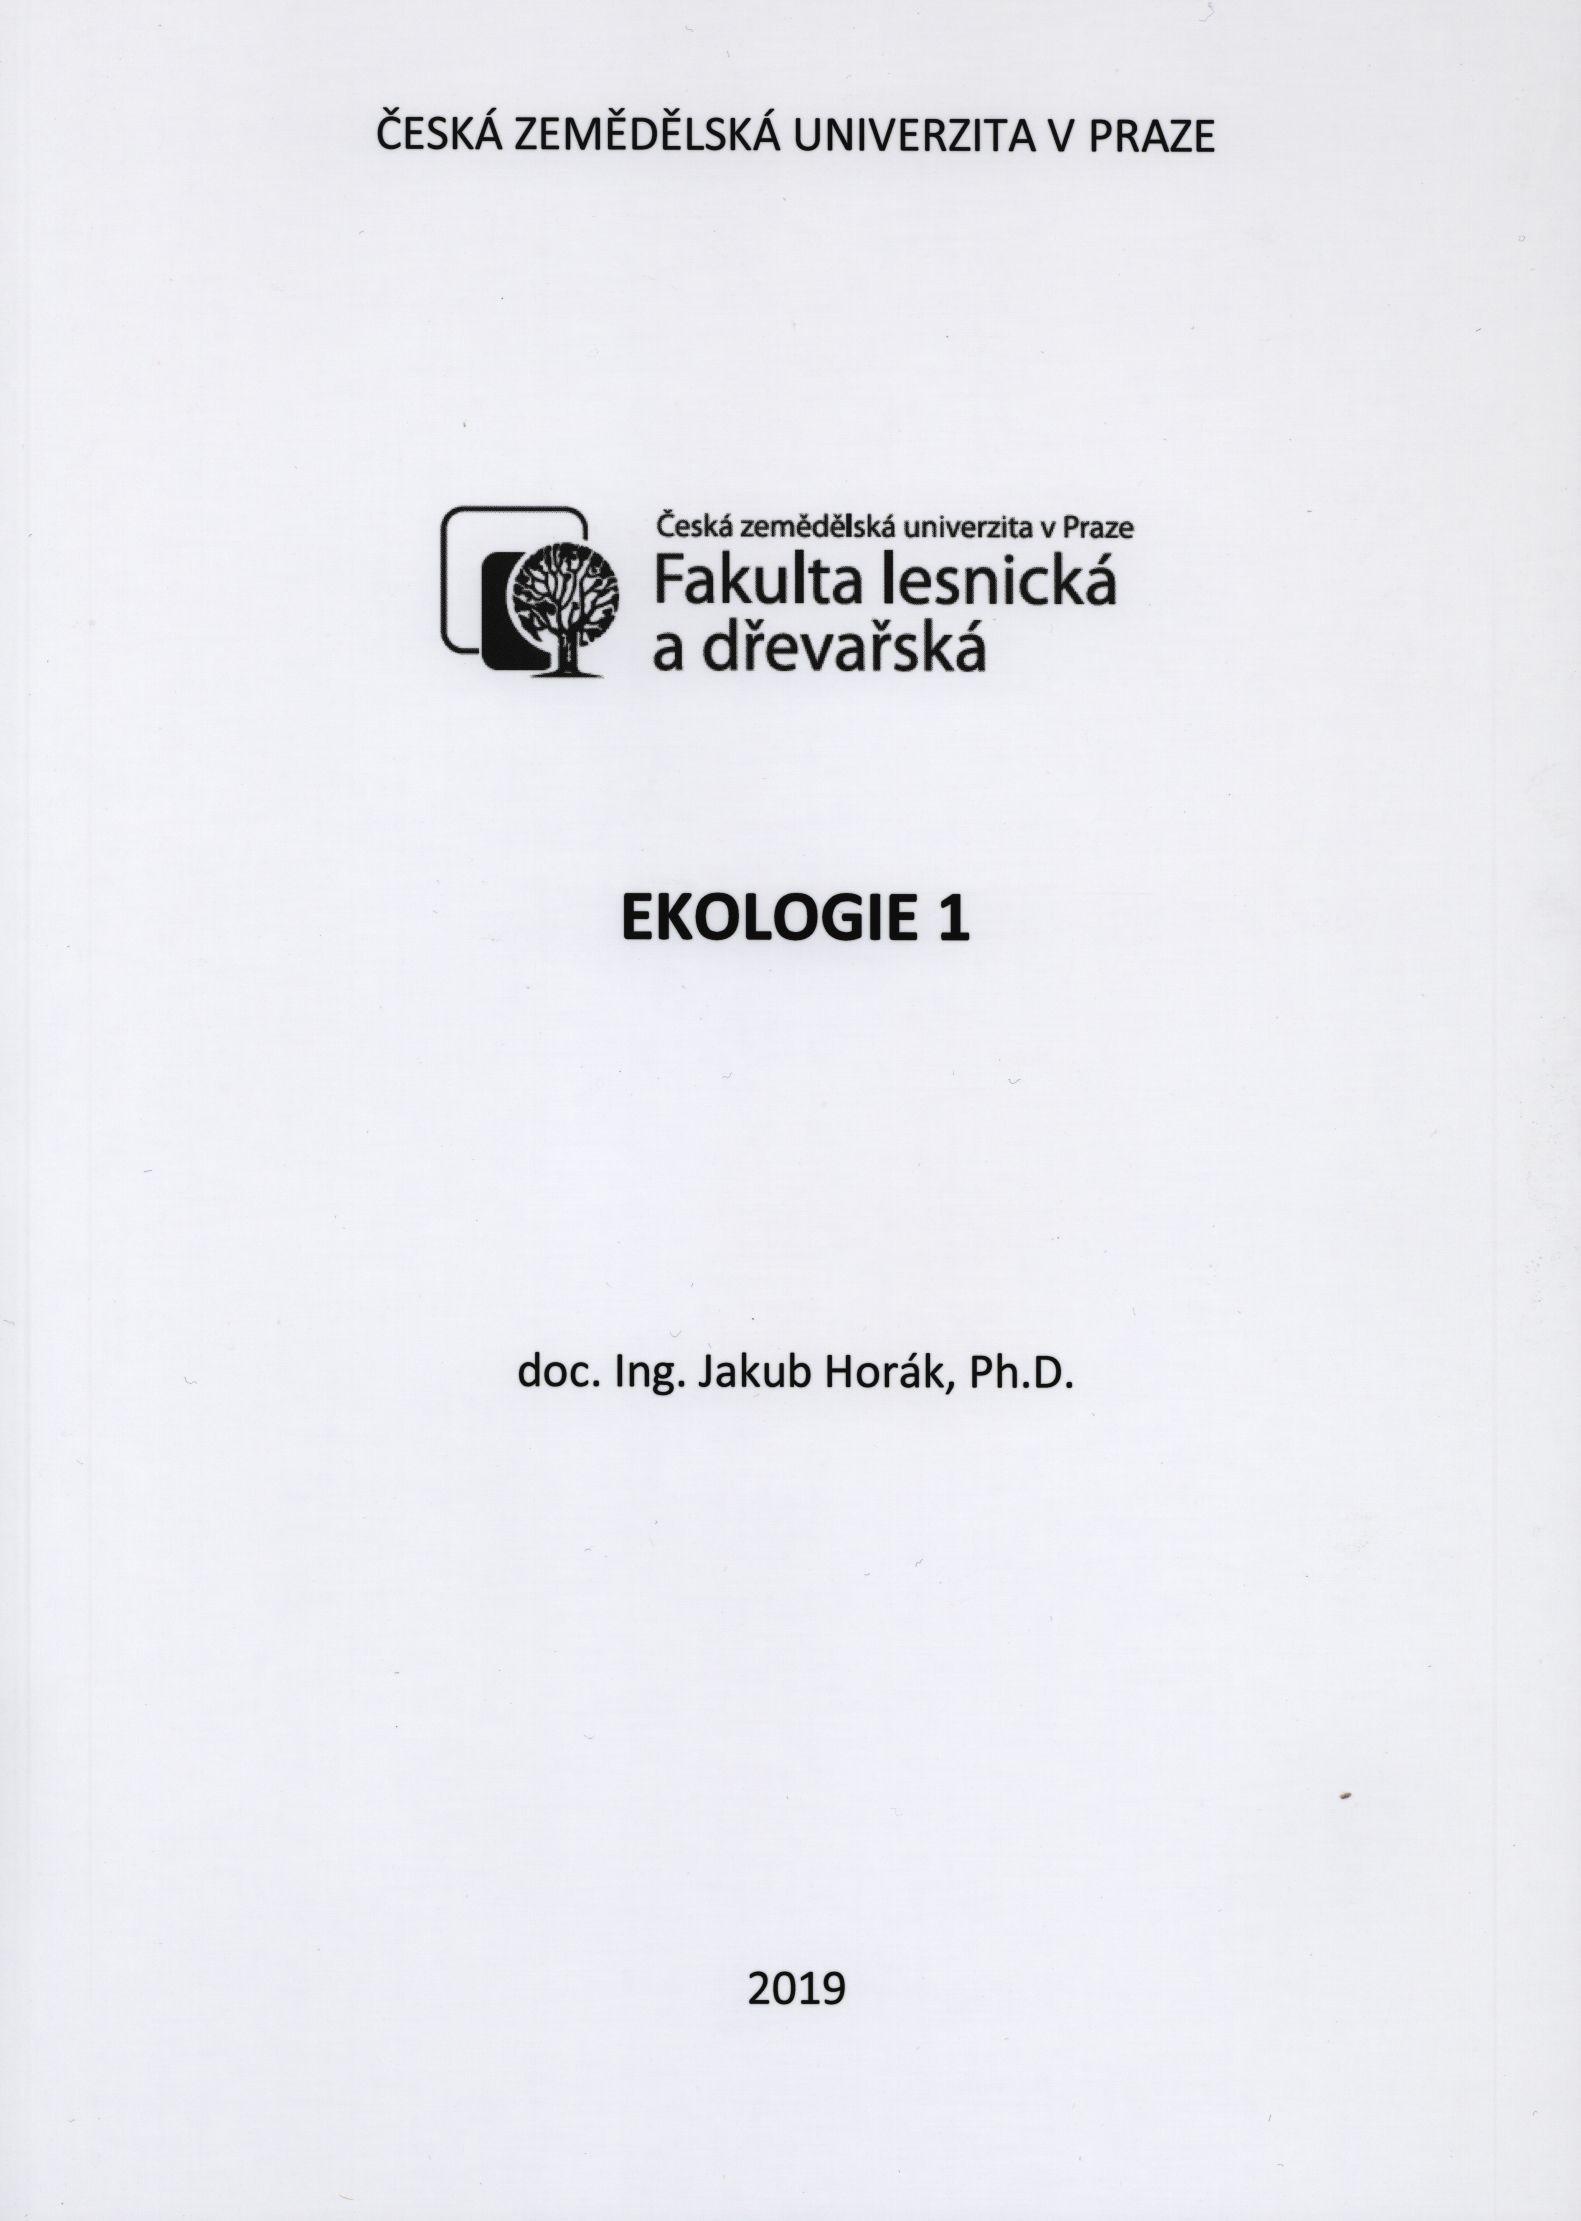 Ekologie 1